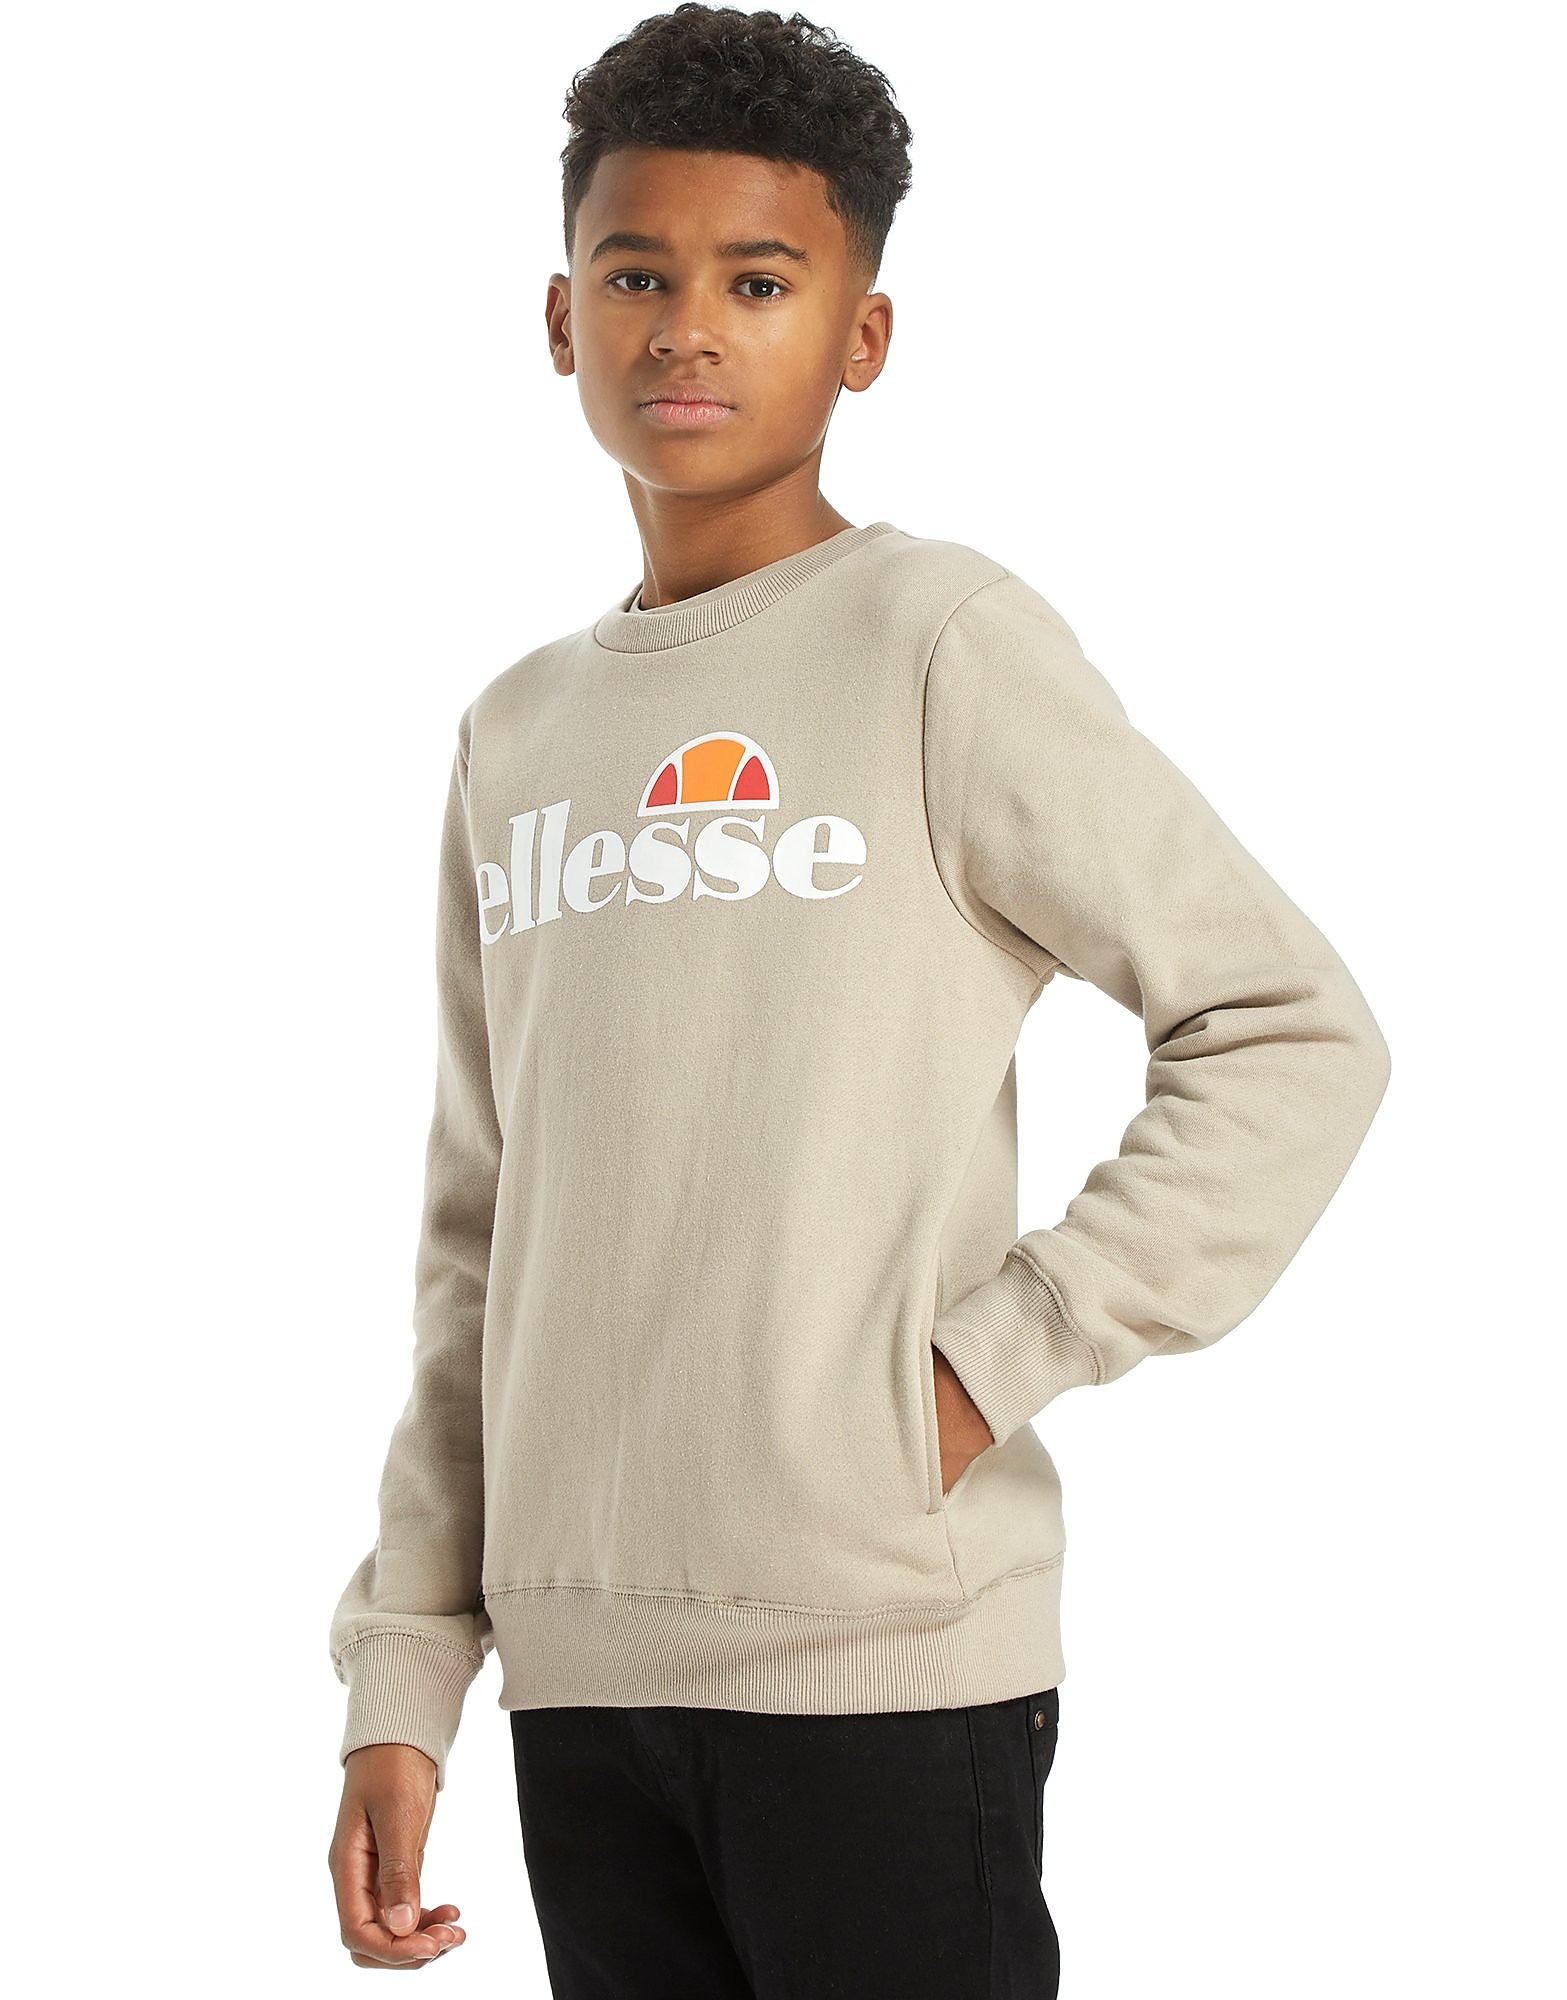 Ellesse Core Crew Sweatshirt Junior